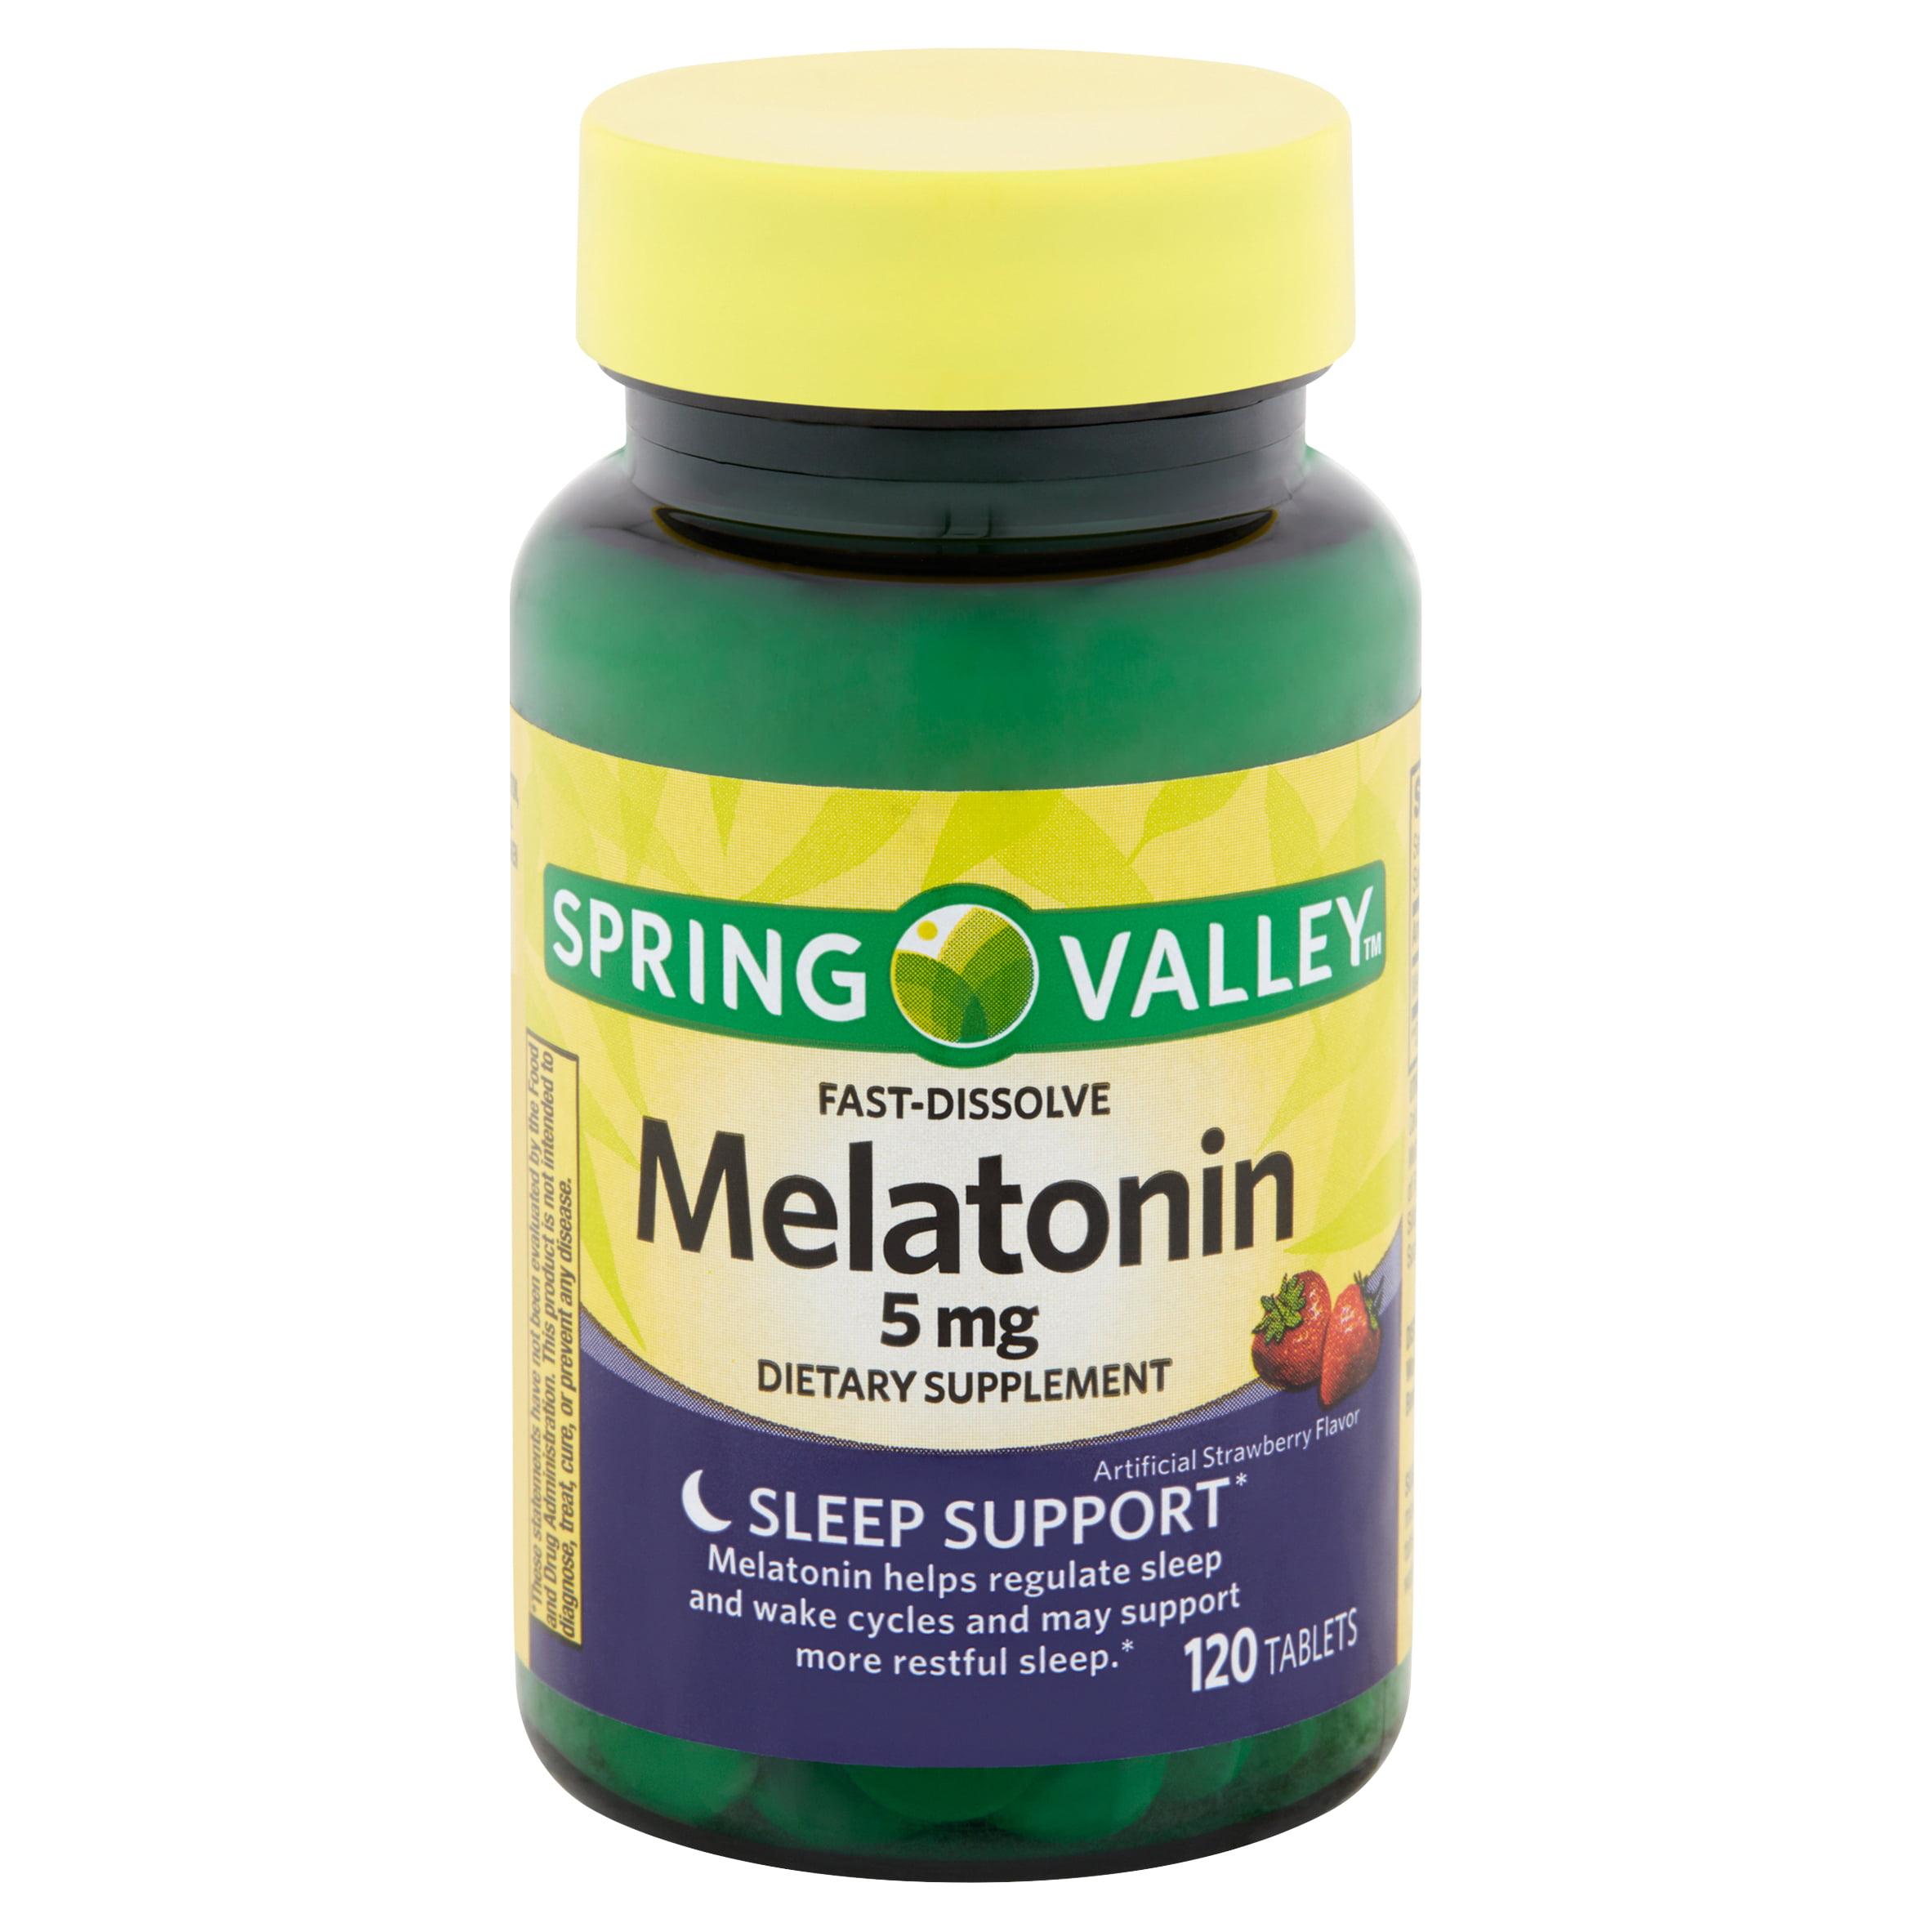 Spring Valley Fast-Dissolve Melatonin Tablets, 5 mg, 120 count